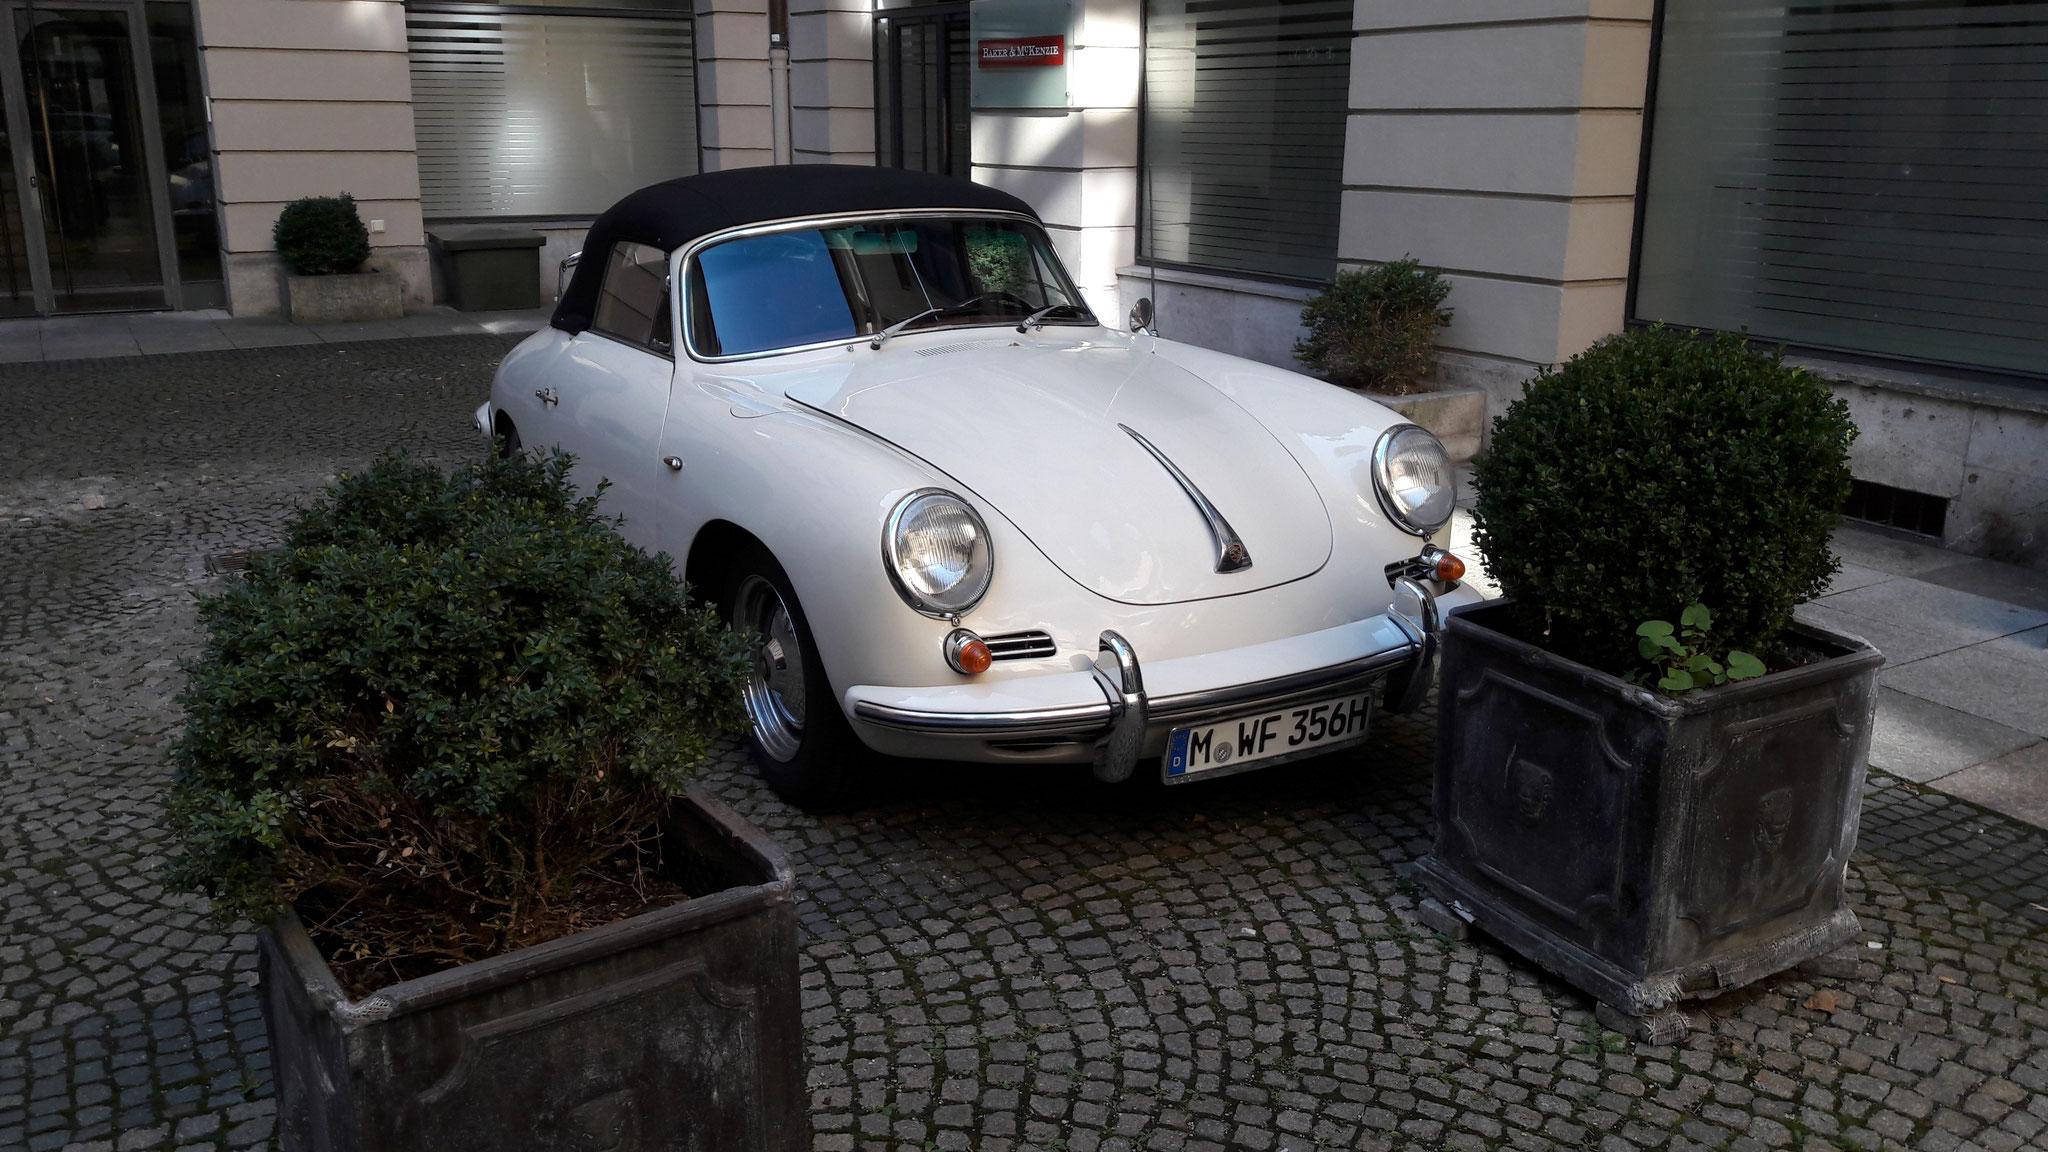 Porsche 356 1600 Super 90 - M-WF-356H